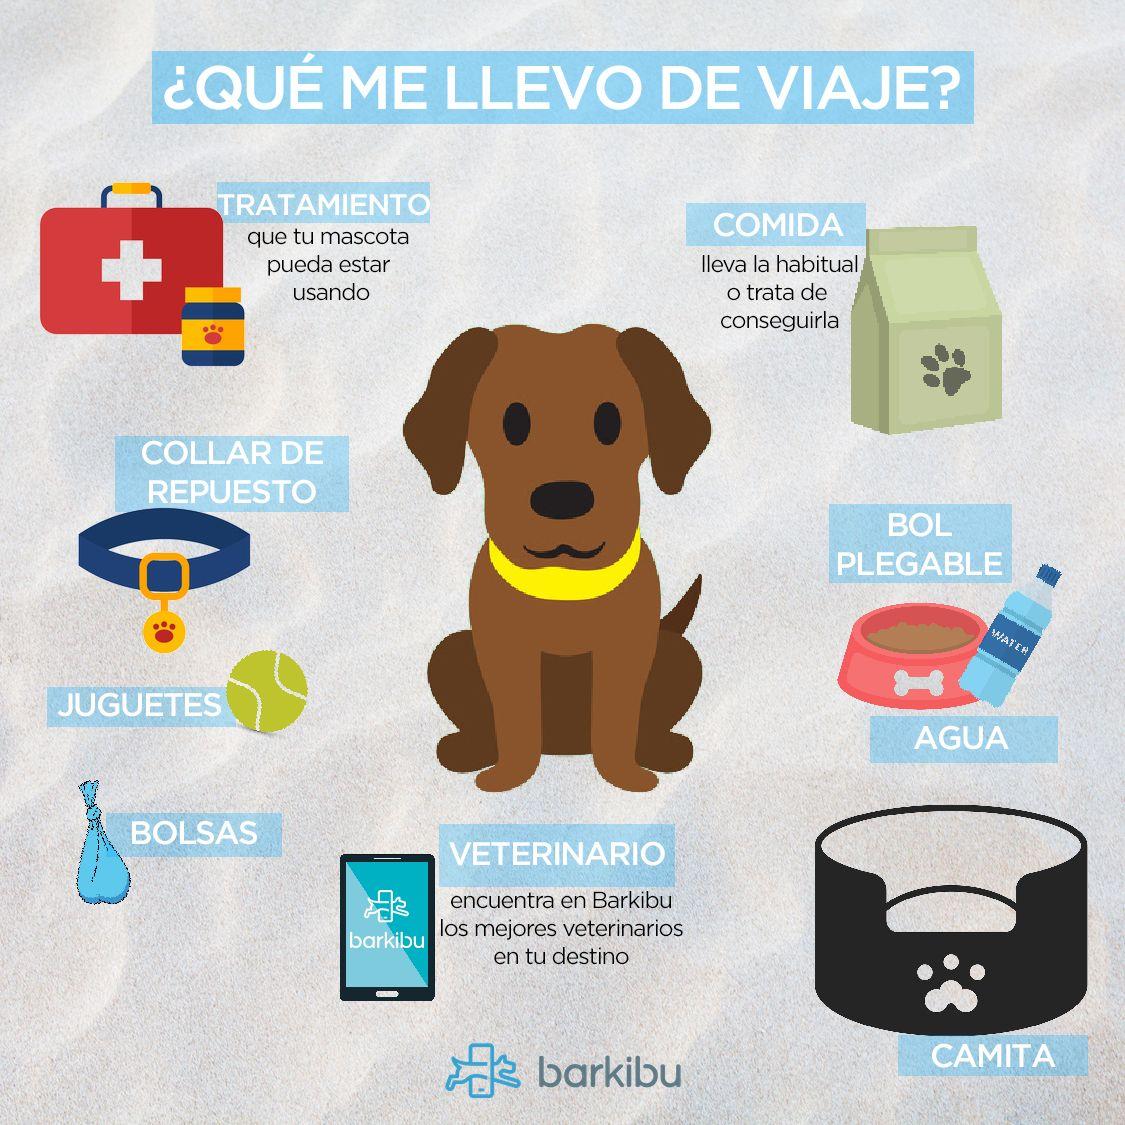 Tipos De Collares De Castigo Para Perros 5 Consejos Para Viajar Con Tu Mascota Viajar Con Perros